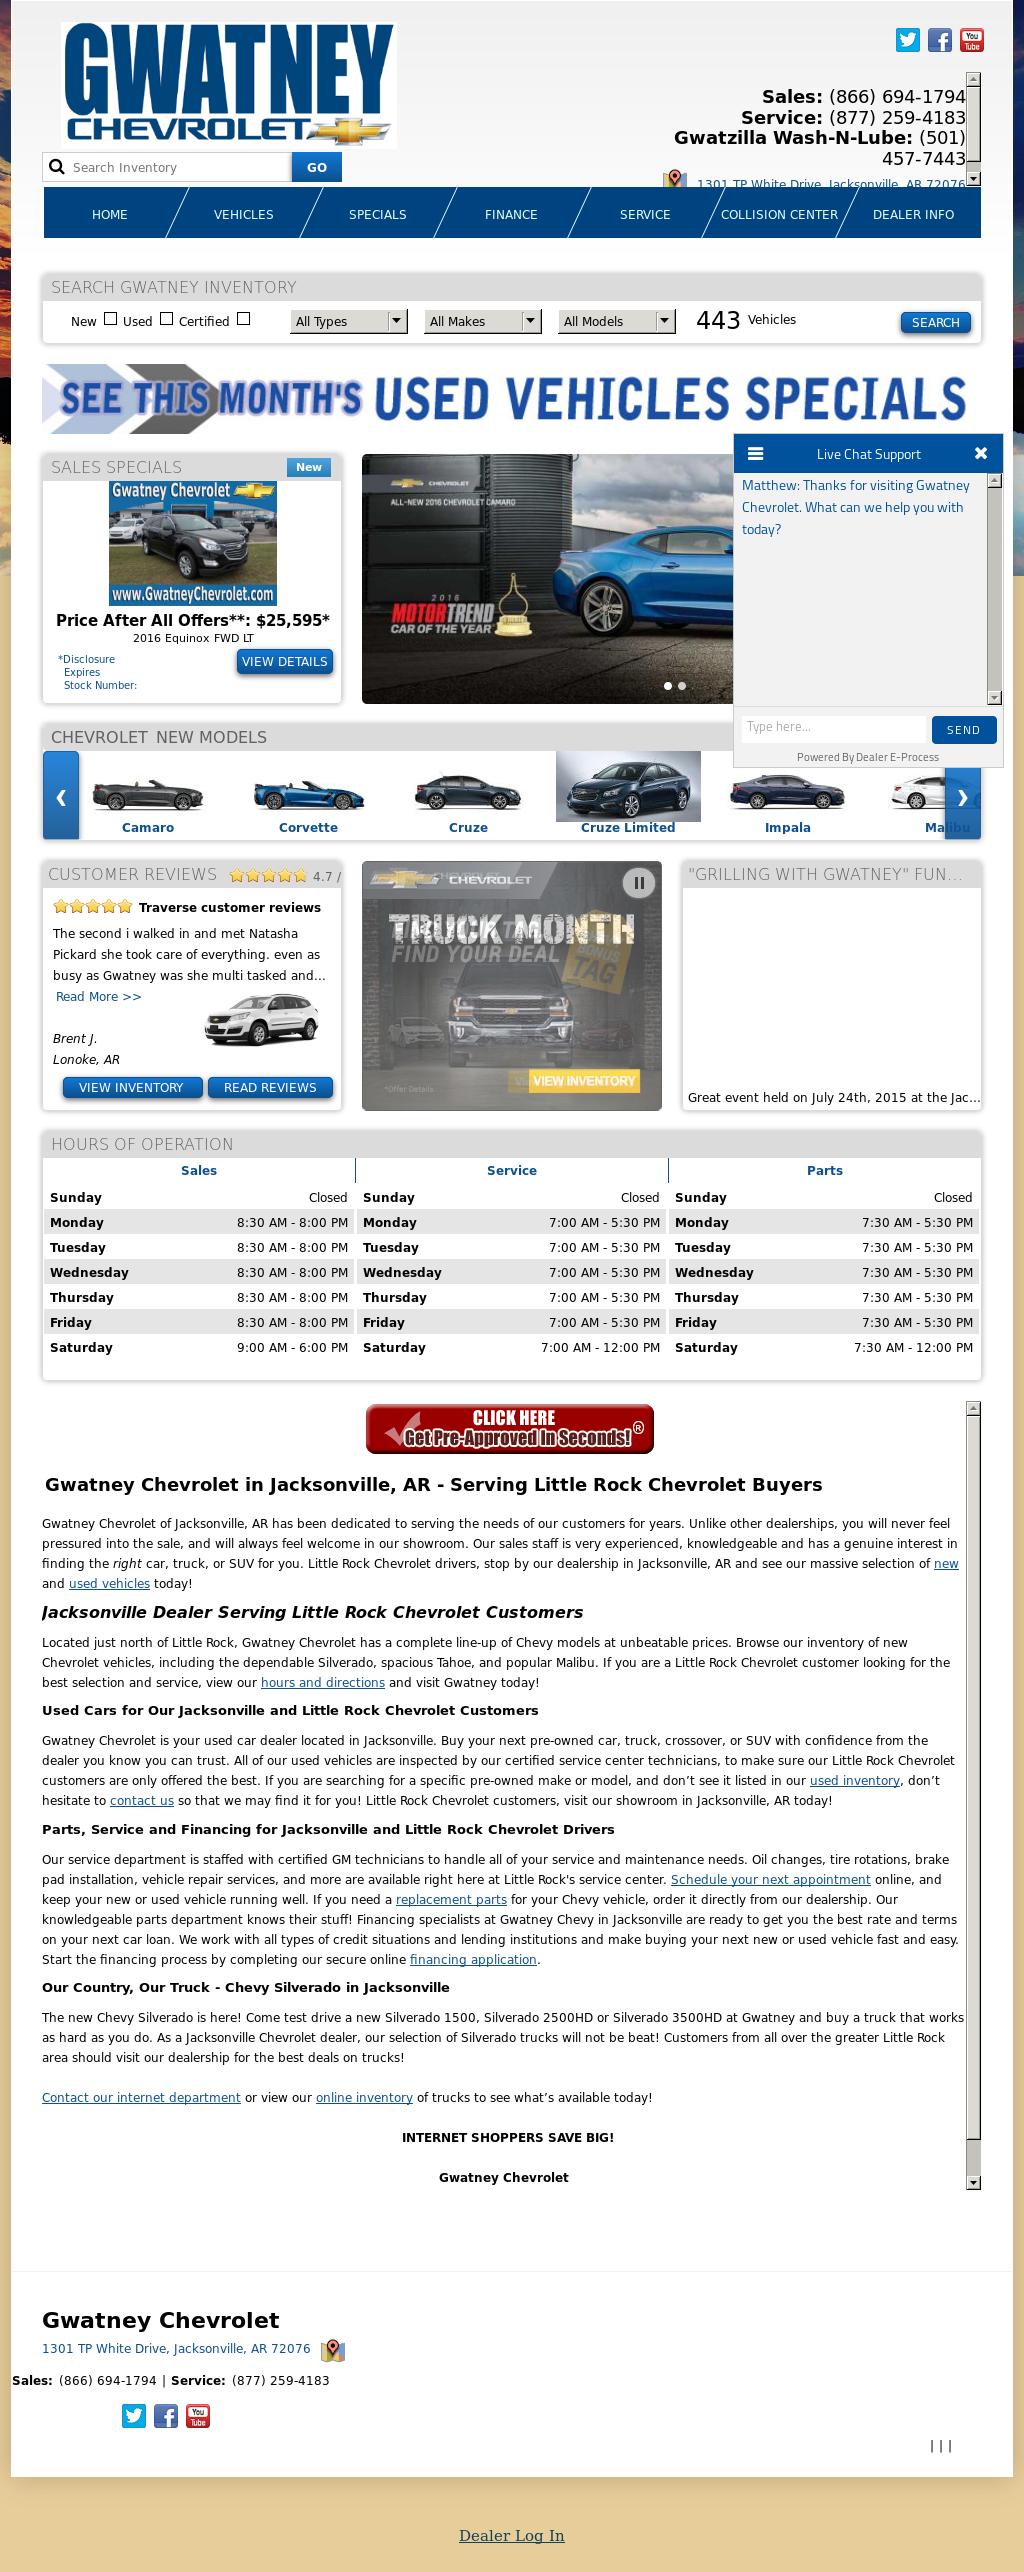 Gwatney Chevrolet Jacksonville Arkansas >> Gwatney Chevrolet Competitors Revenue And Employees Owler